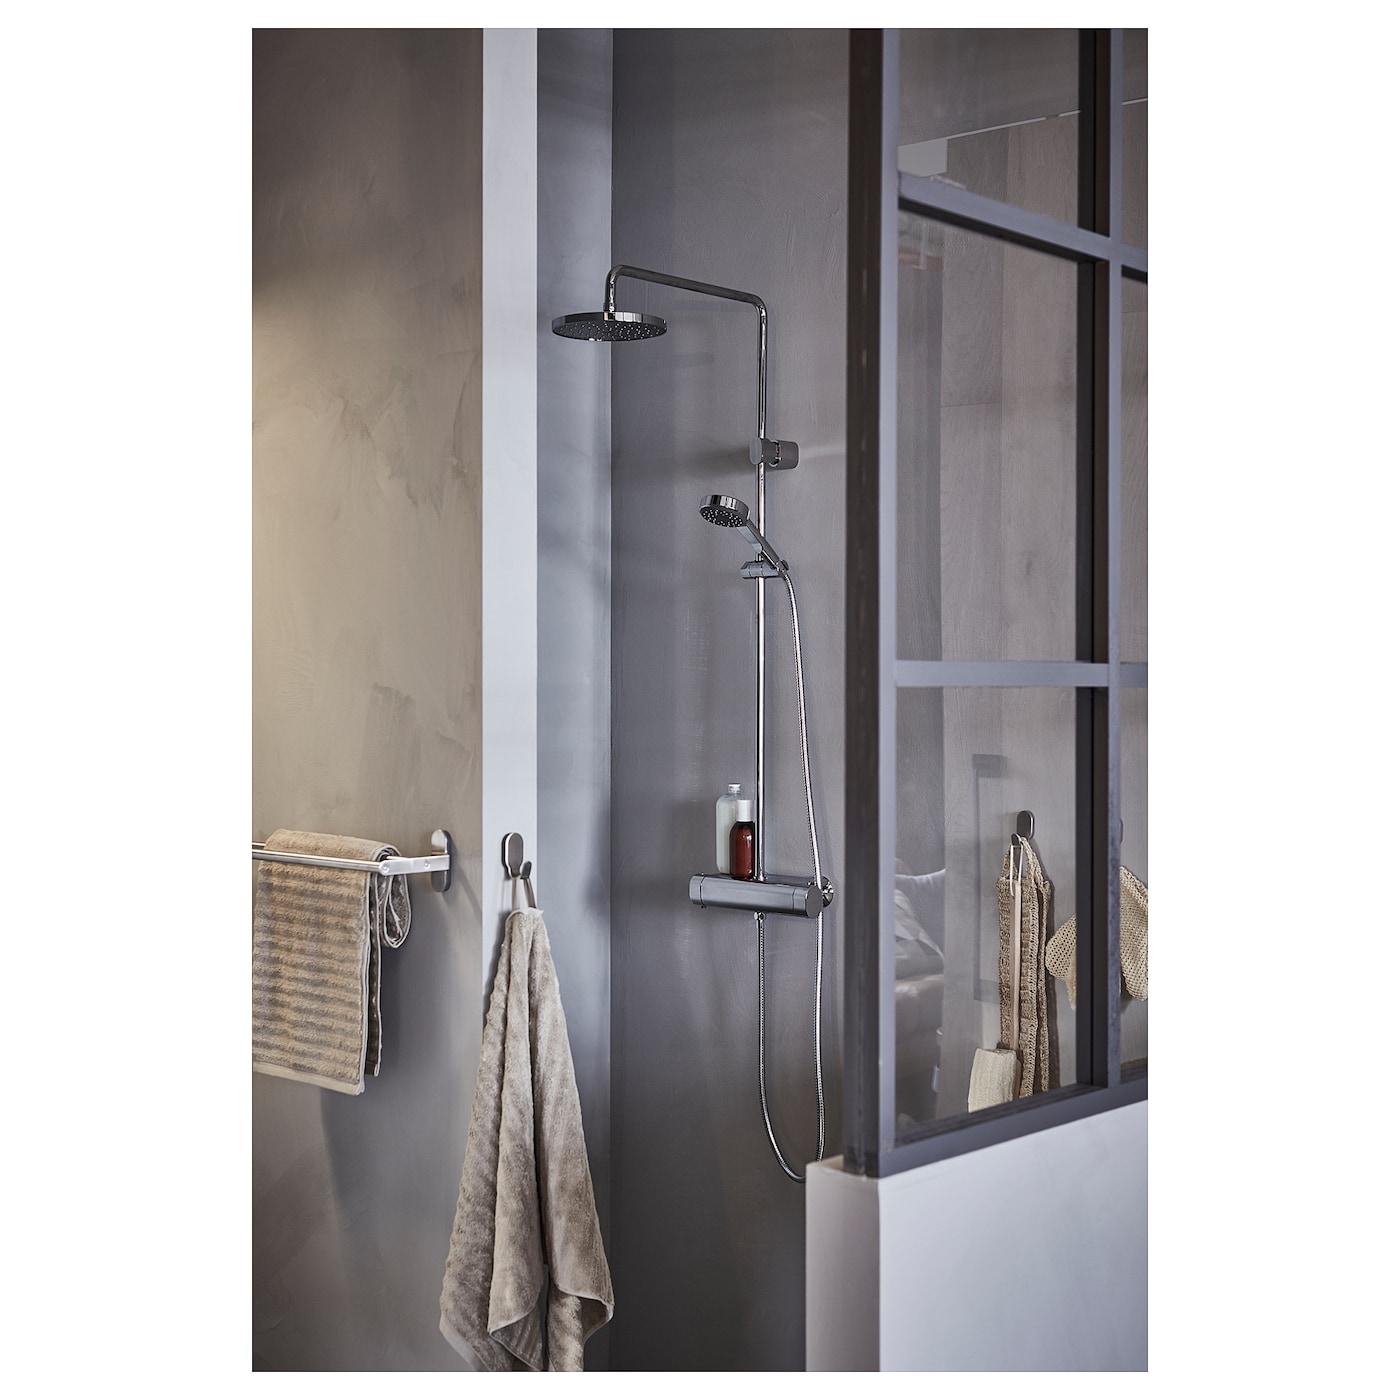 BROGRUND Towel rail - stainless steel 5 cm